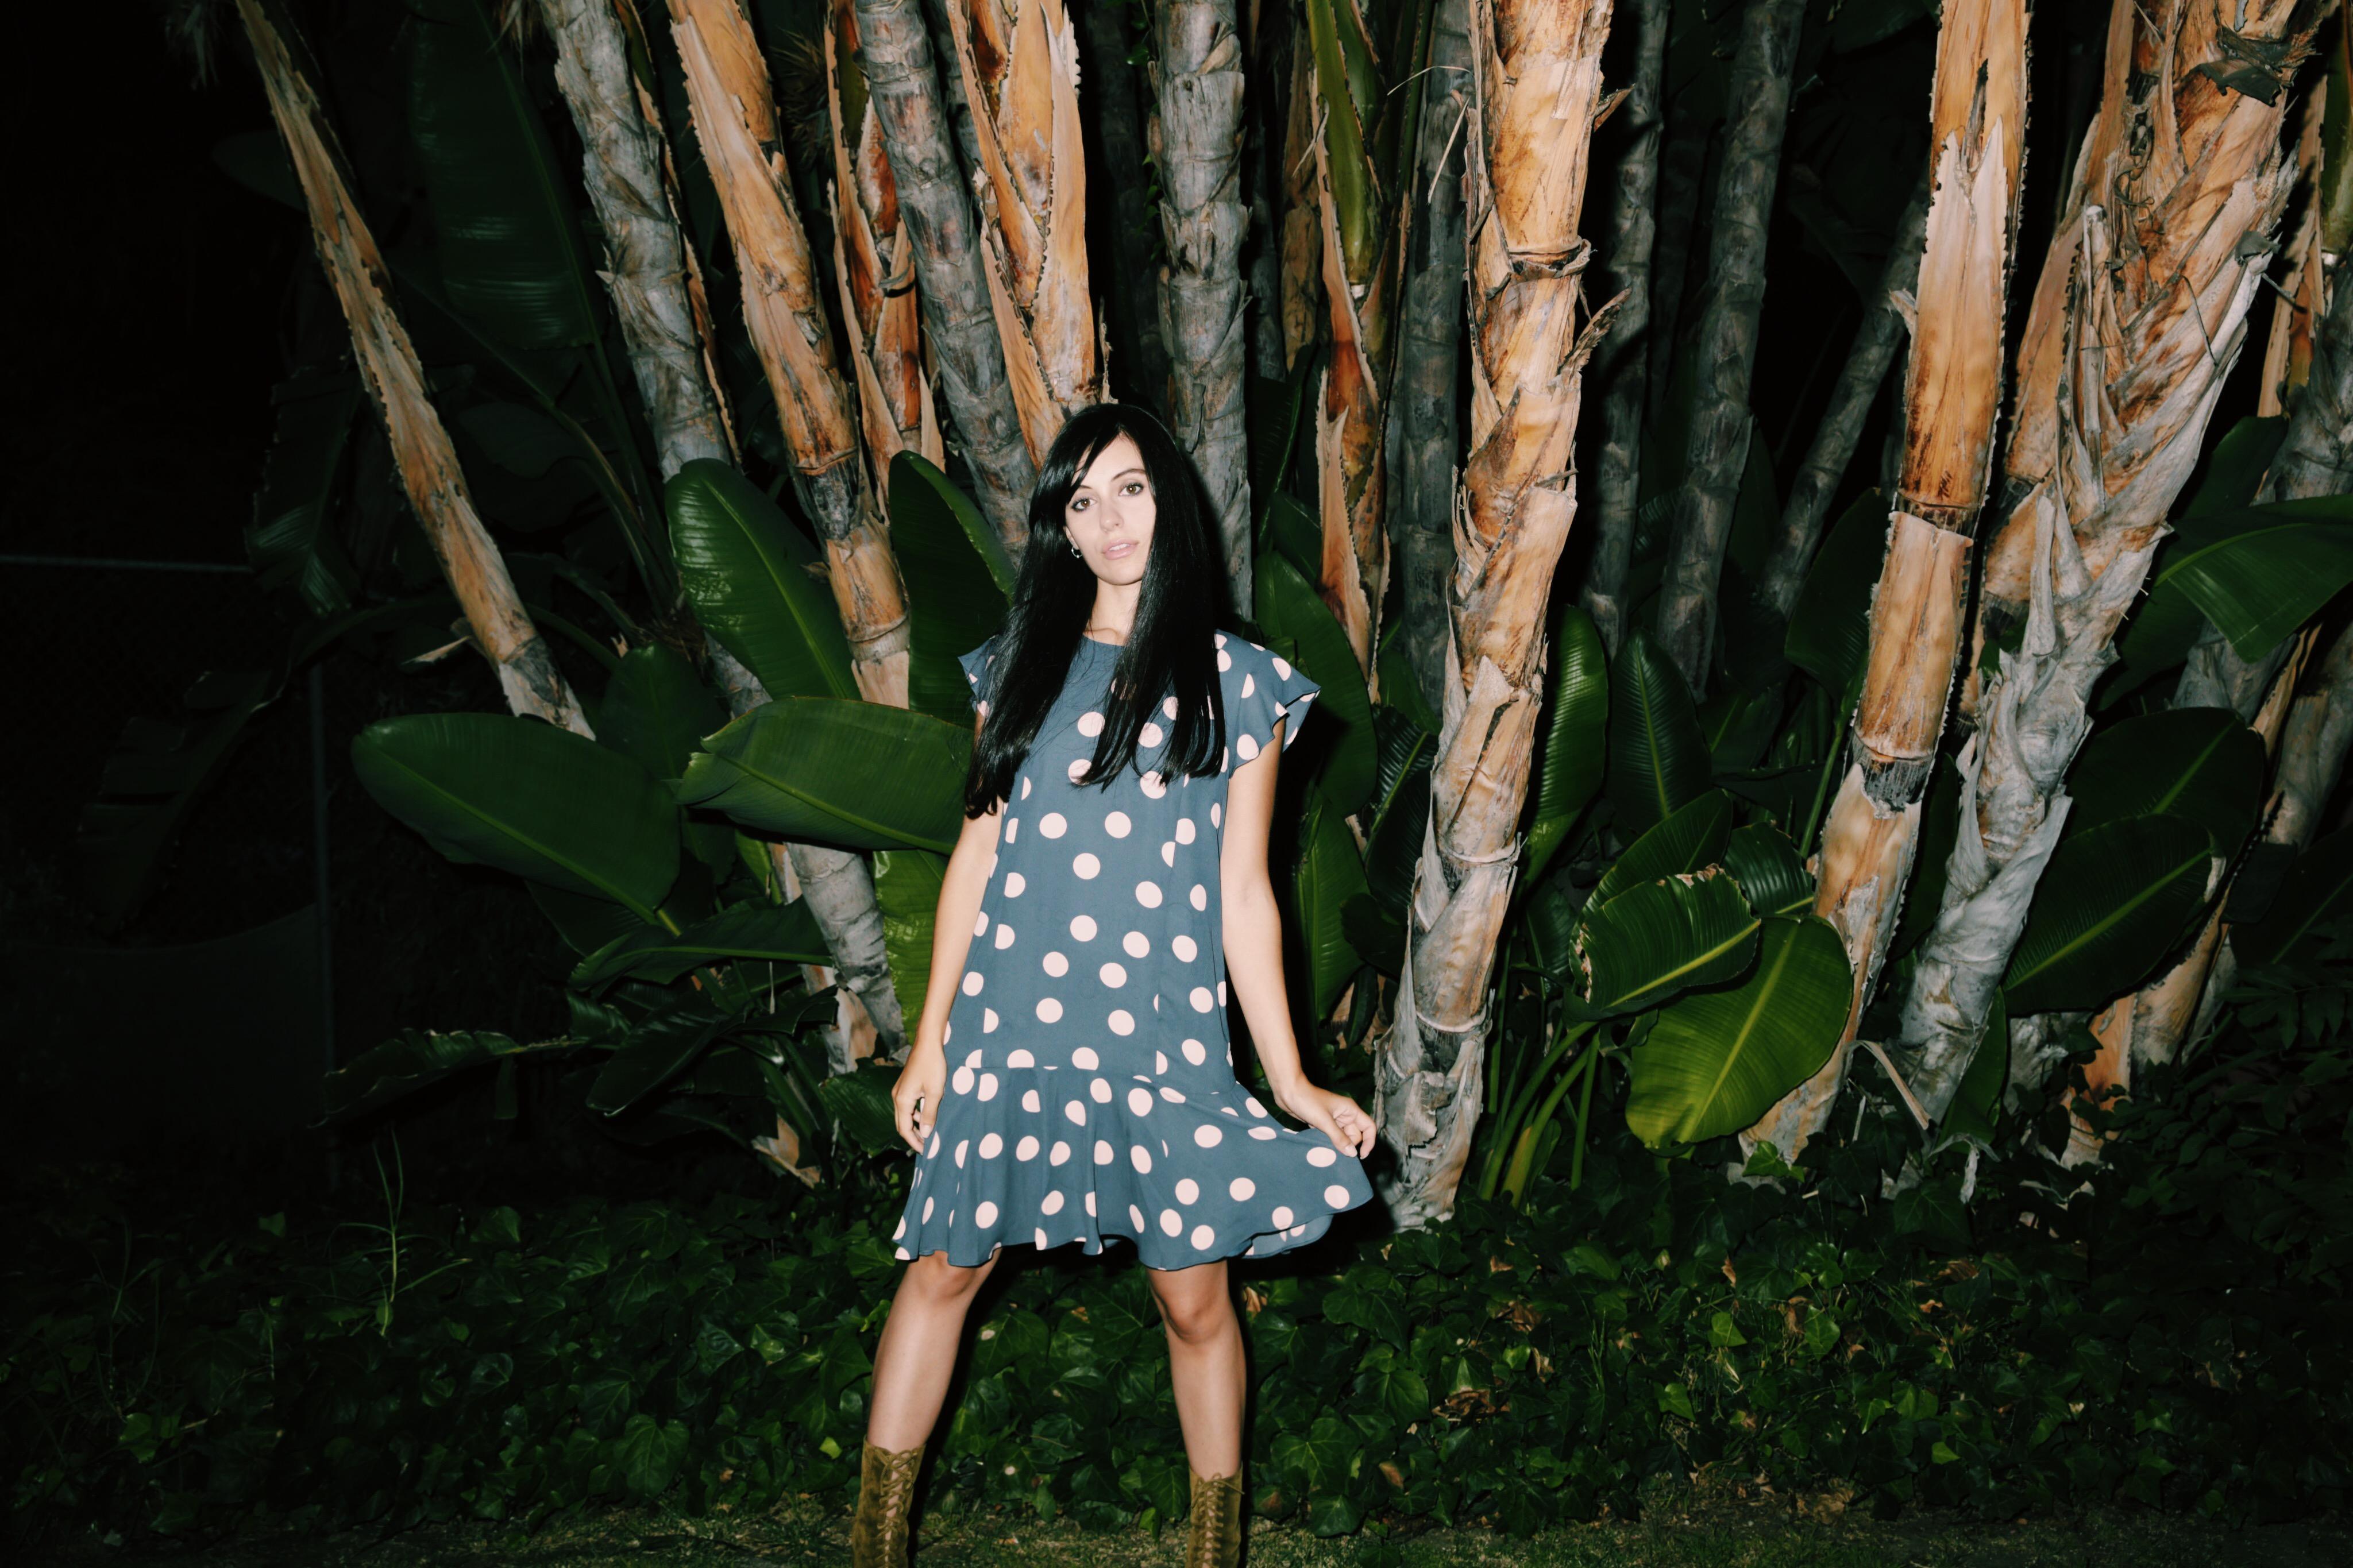 Blogger and actress Marta Pozzan wearing LOFT polka dots dress and Valas booties.